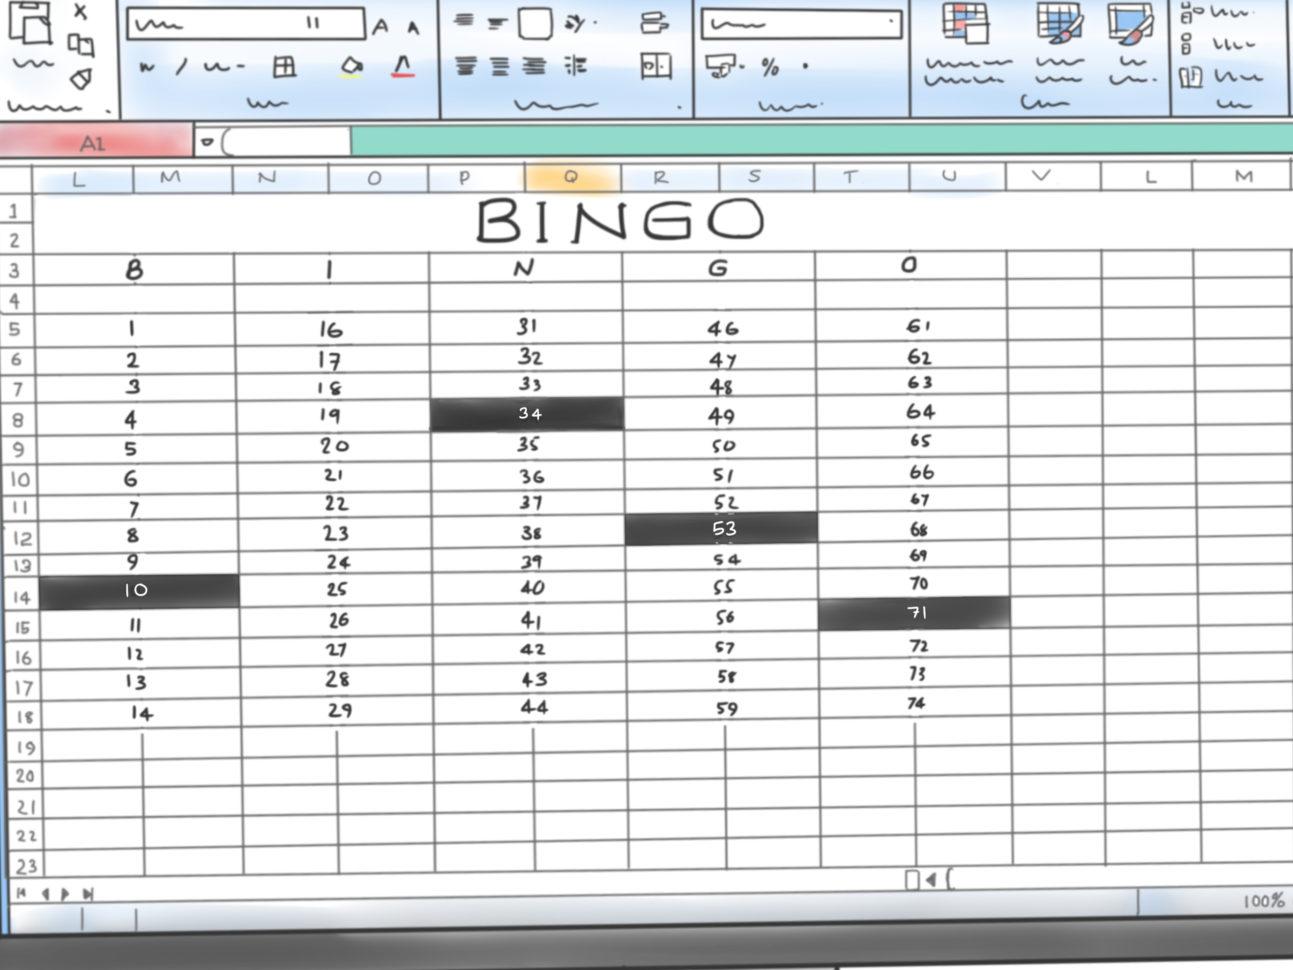 Bingo Spreadsheet Inside How To Make A Bingo Game In